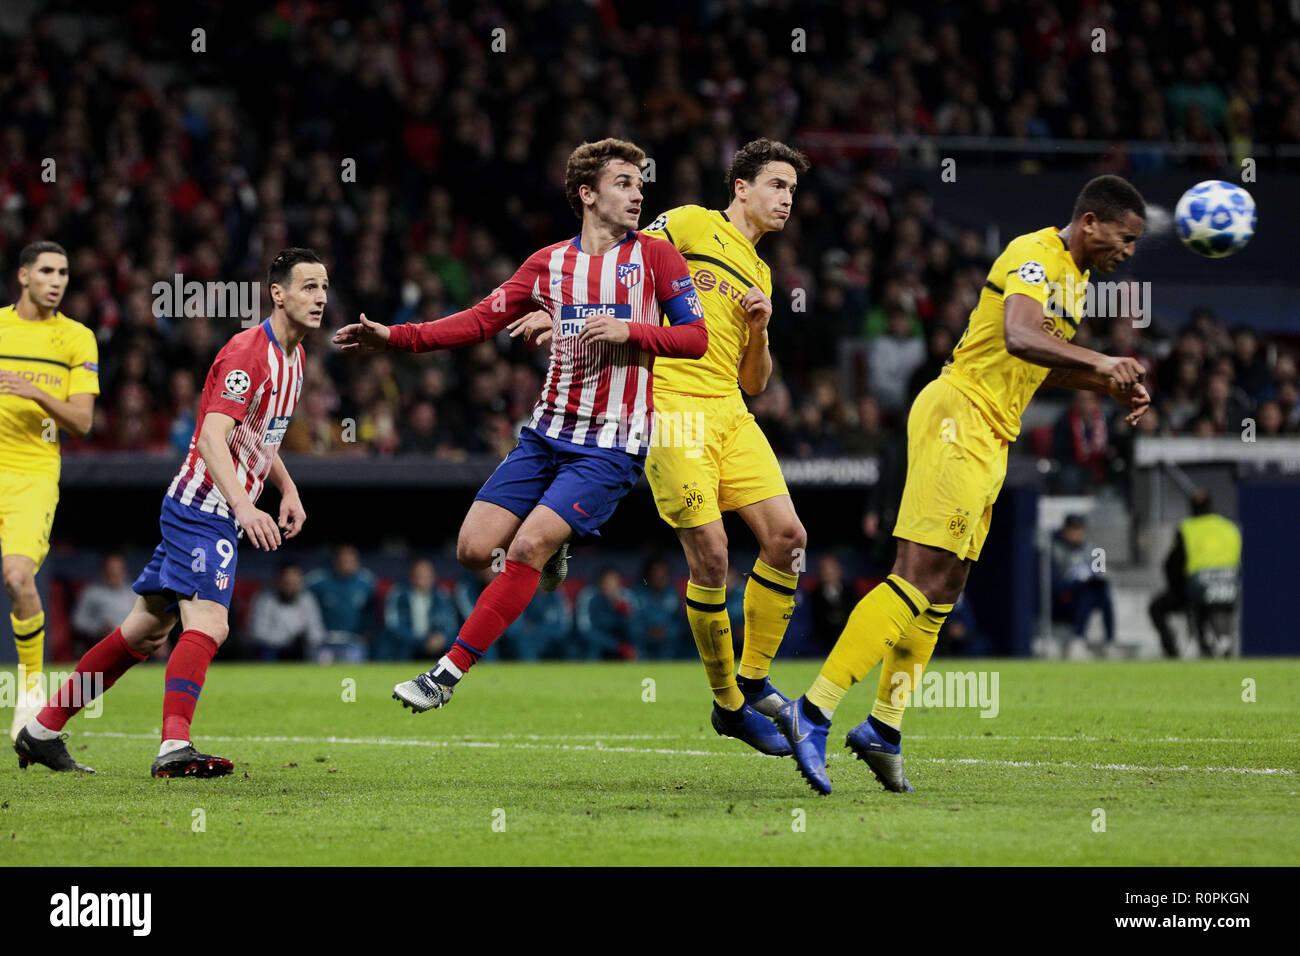 Madrid, Madrid, Spain  6th Nov, 2018  Atletico de Madrid's Antoine